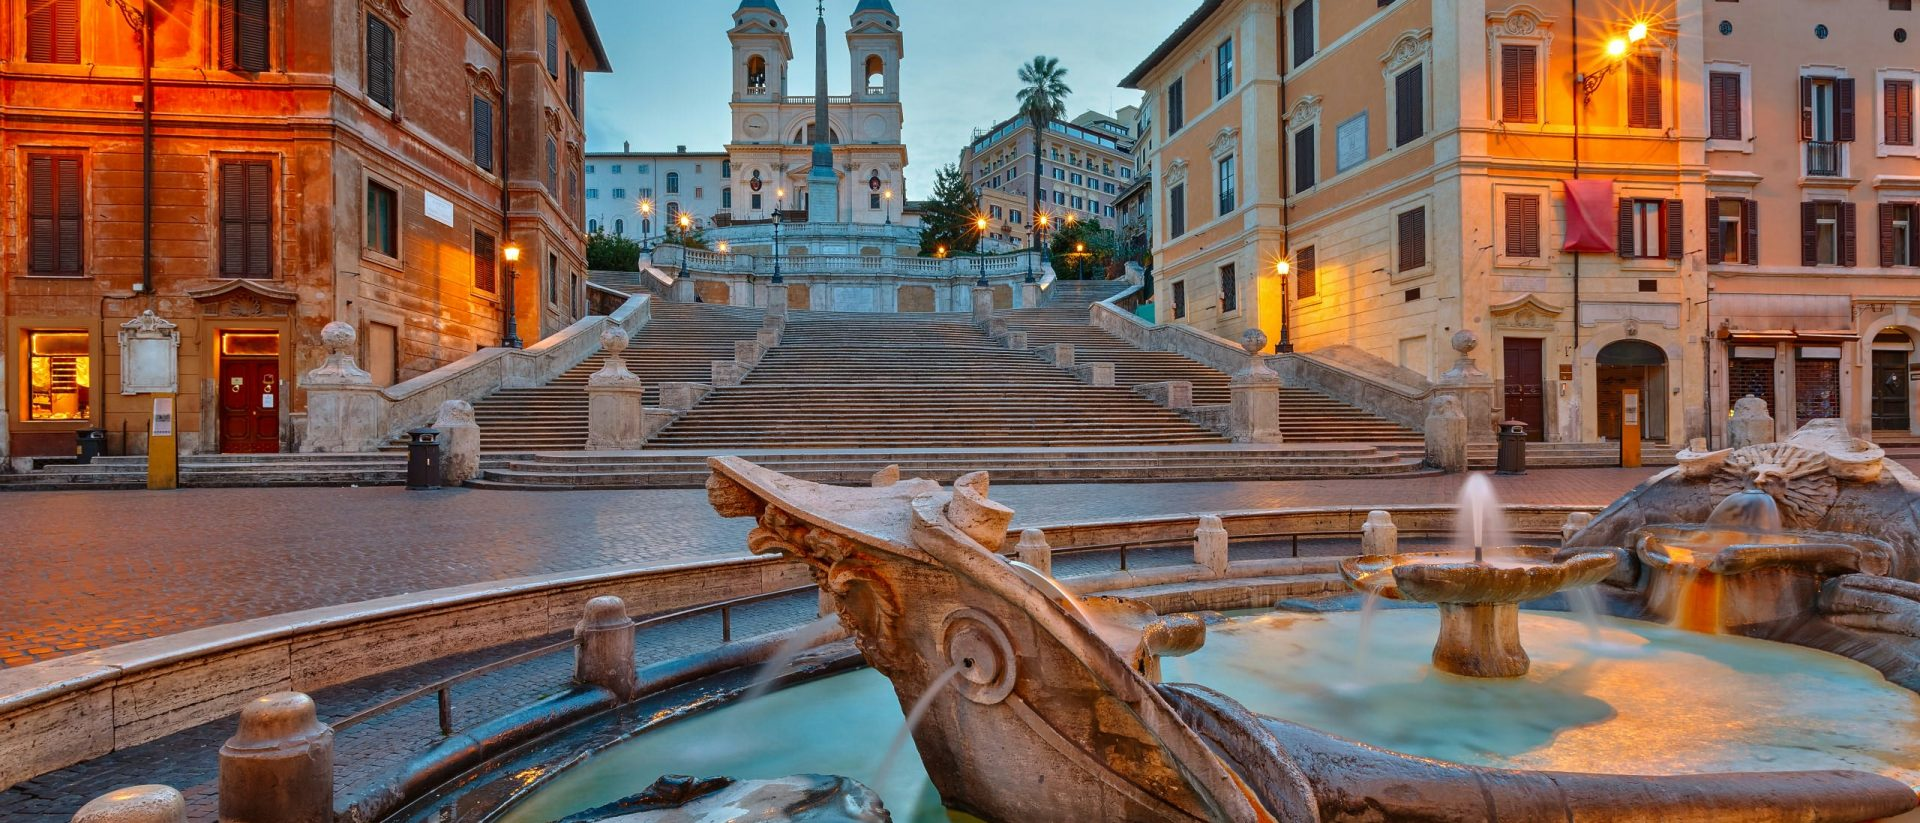 Camera di lusso a Roma in Piazza Navona